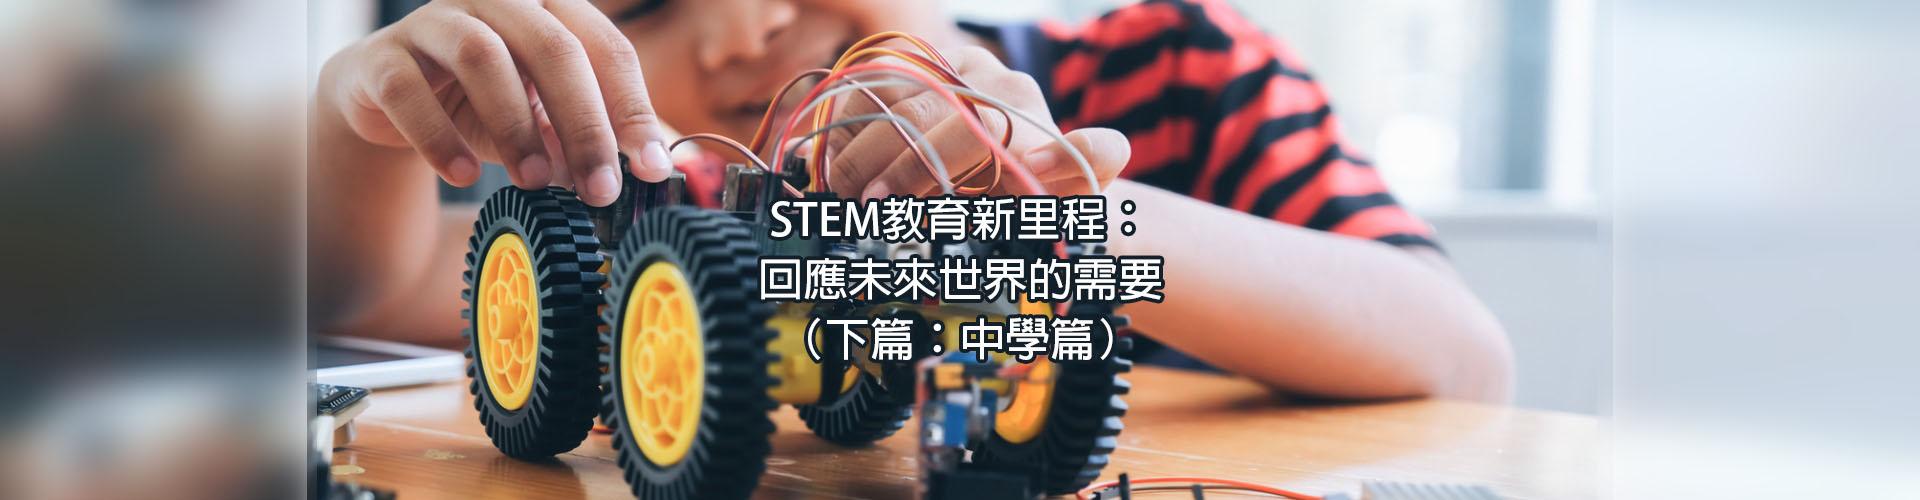 img_STEM教育新里程_回應未來世界的需要_下篇_中學篇